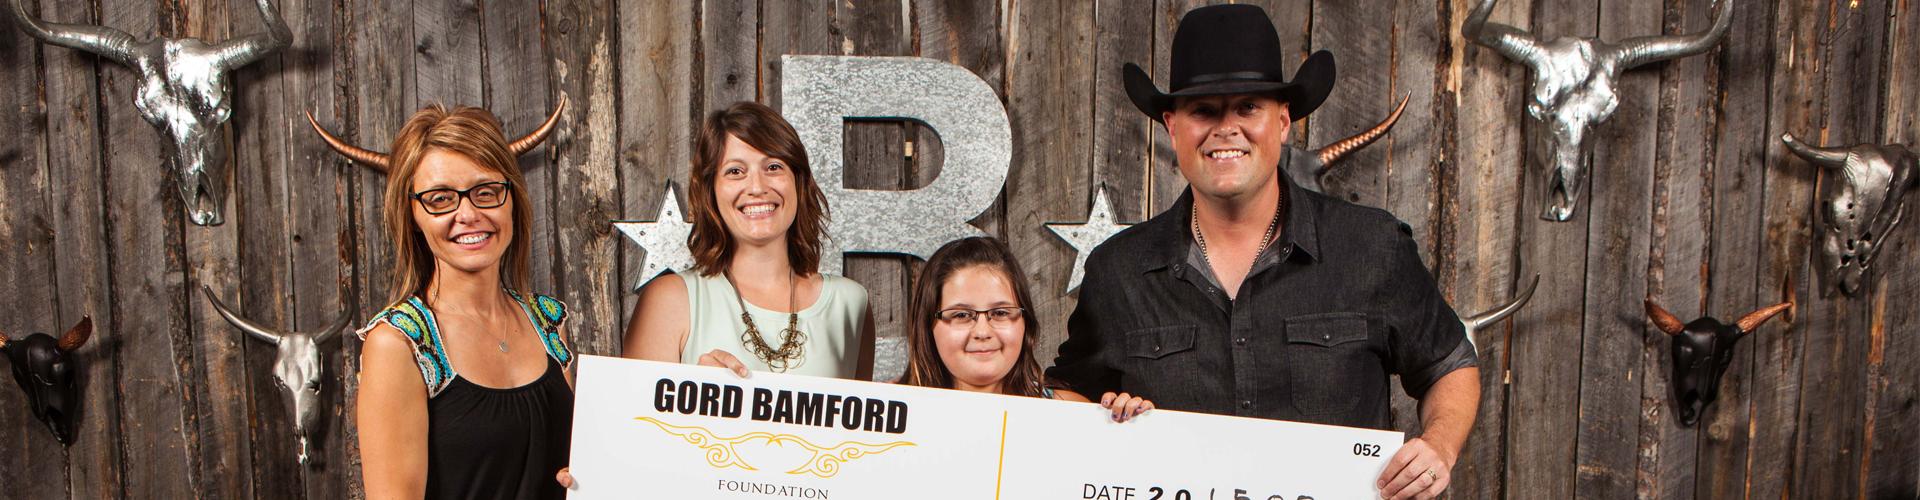 gord-bamford-foundation-beneficiary-application